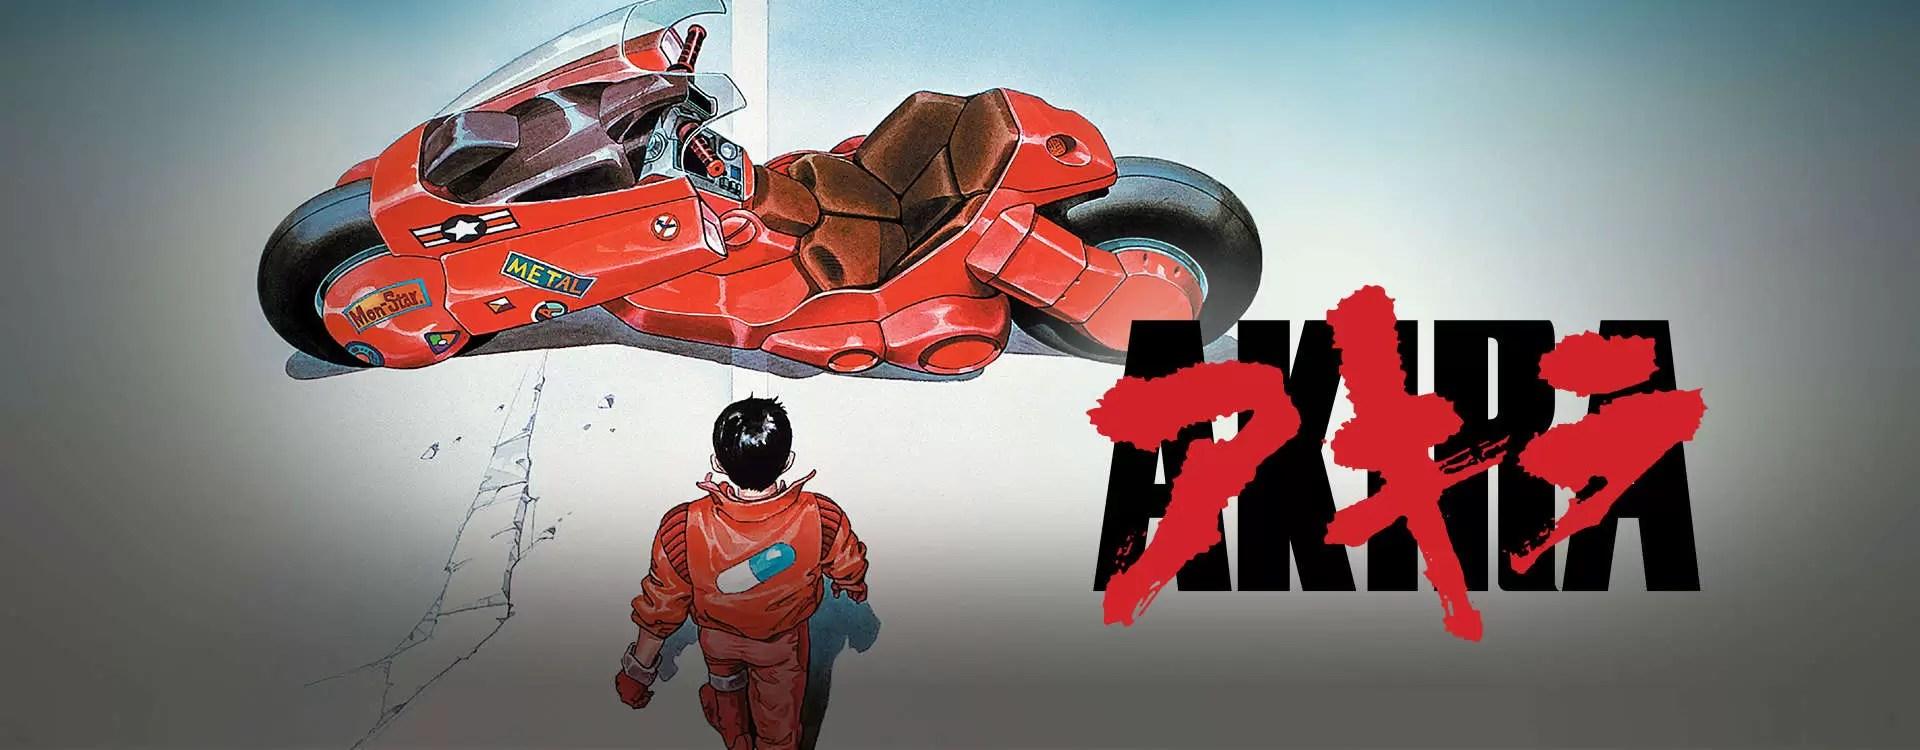 Futuristic Anime Biker Wwwtopsimagescom